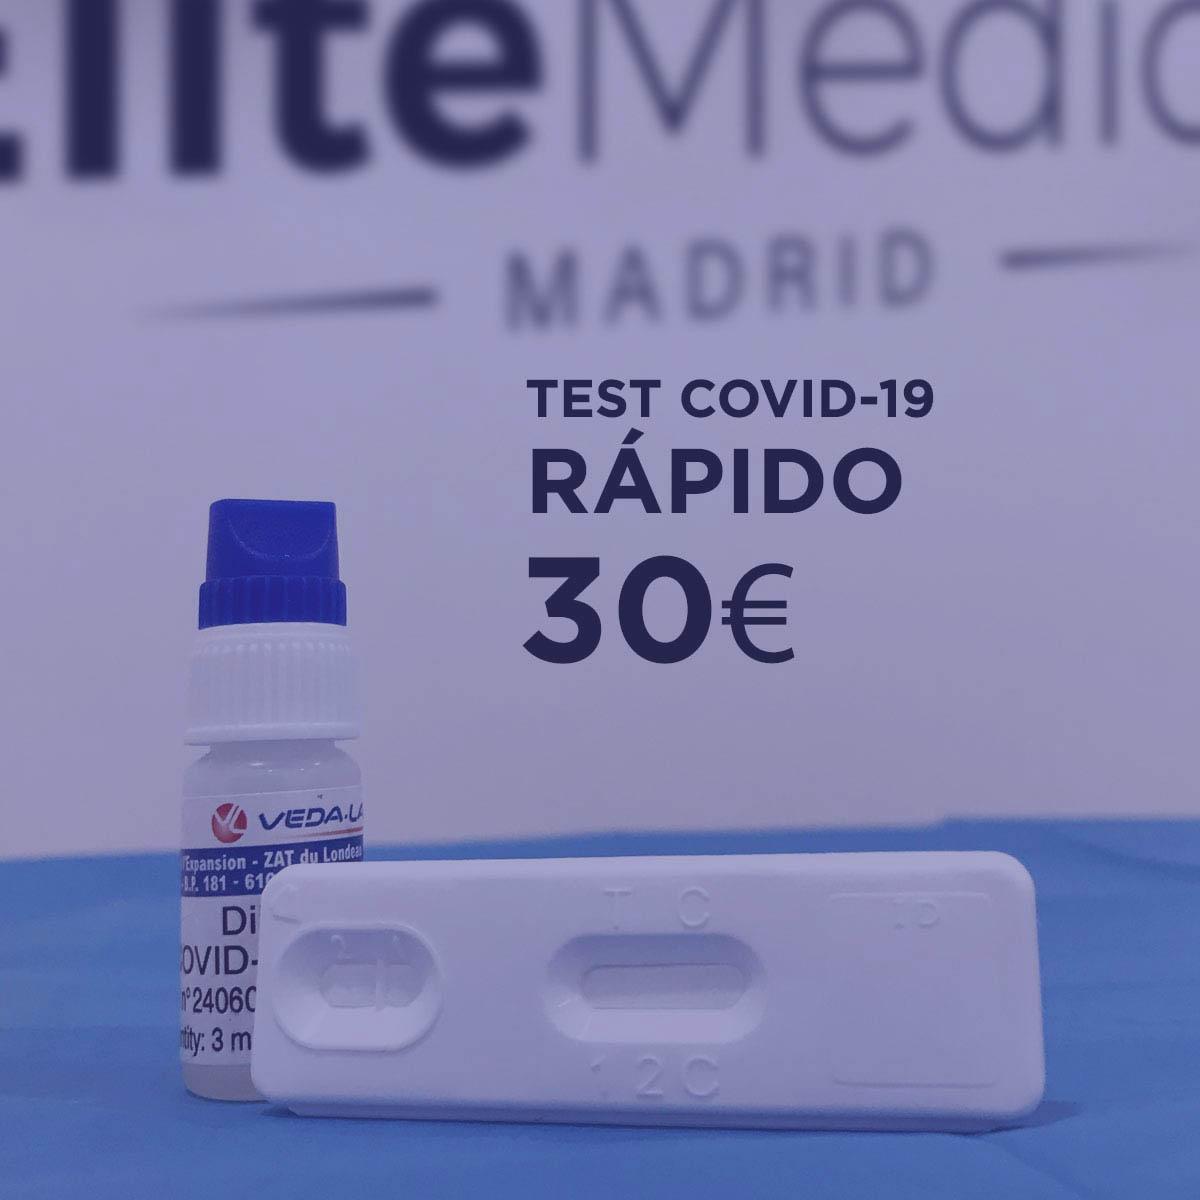 Test rápido Análisis Covid-19 en Élite Medical Madrid